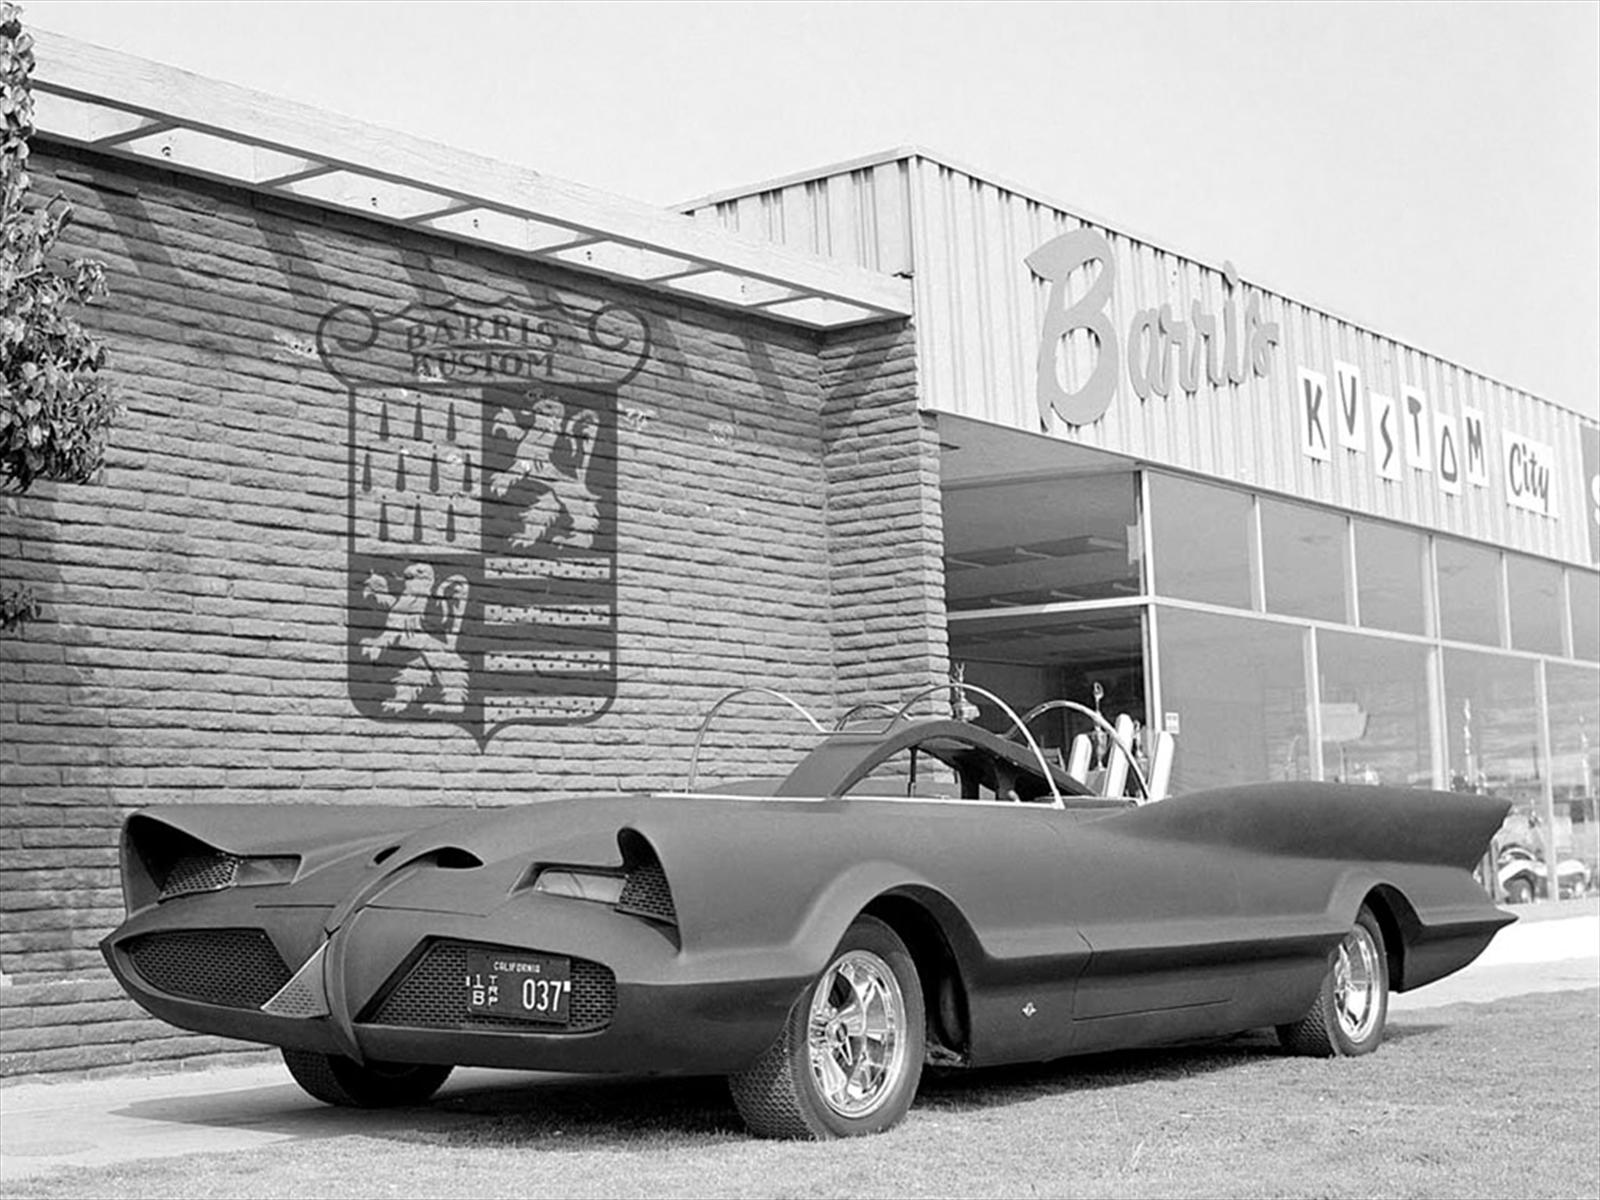 Retro Concepts Lincoln Futura 1954 Autocosmos Com